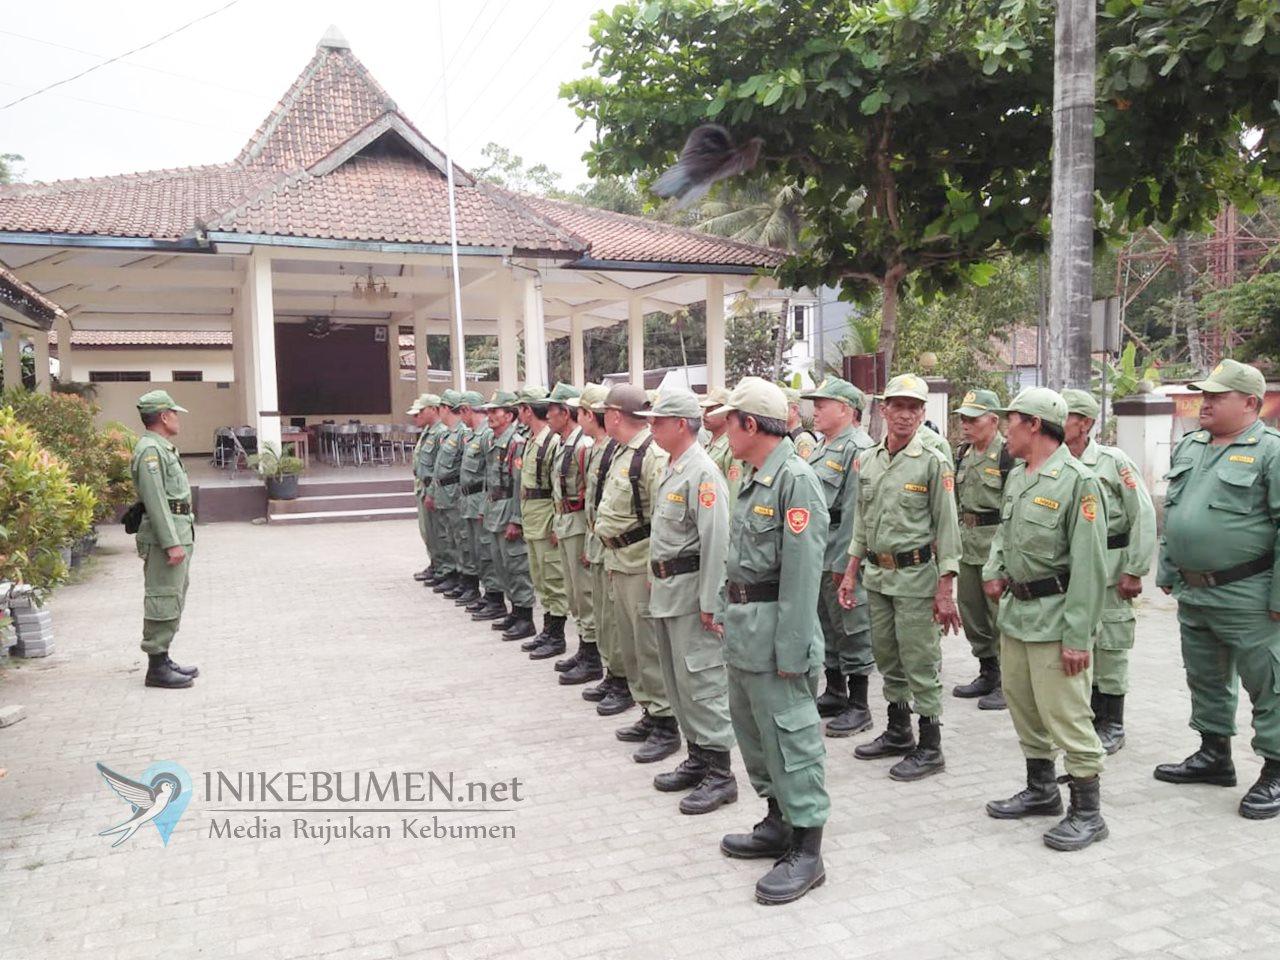 Jelang Pilkades Serentak, 32 Anggota Linmas di Ambal Digembleng